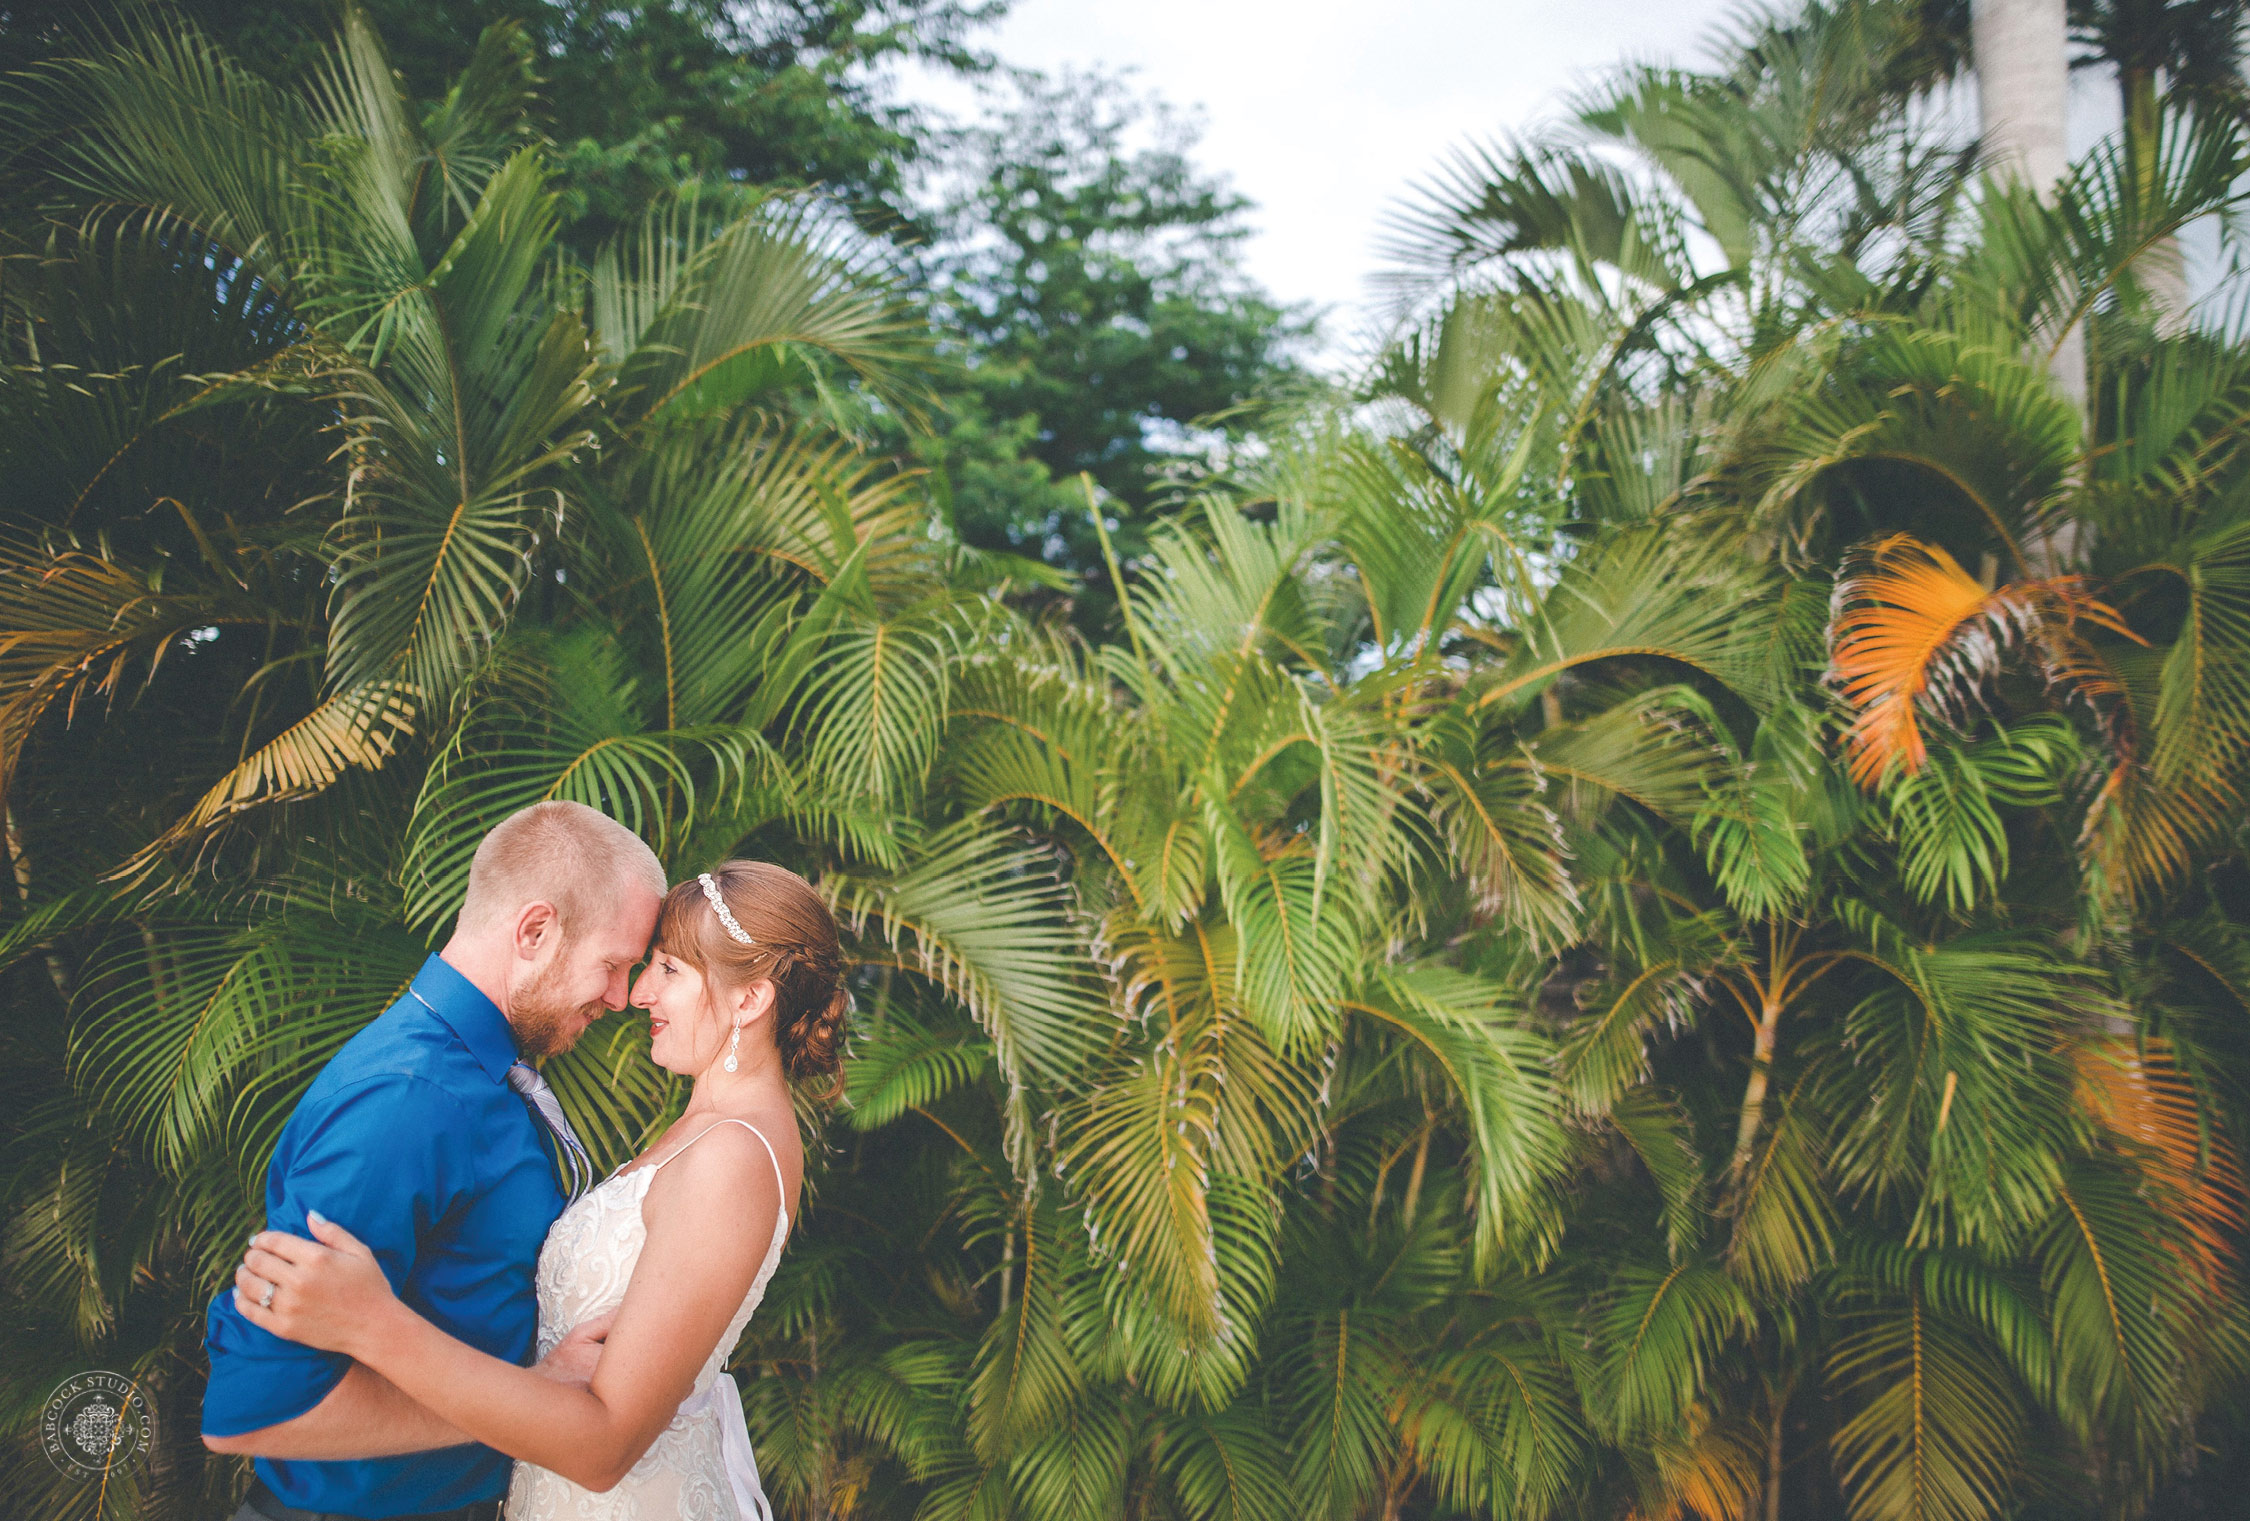 2cat-brandon-costa-rica-destination-wedding-photographer-dayton-ohio-30.jpg